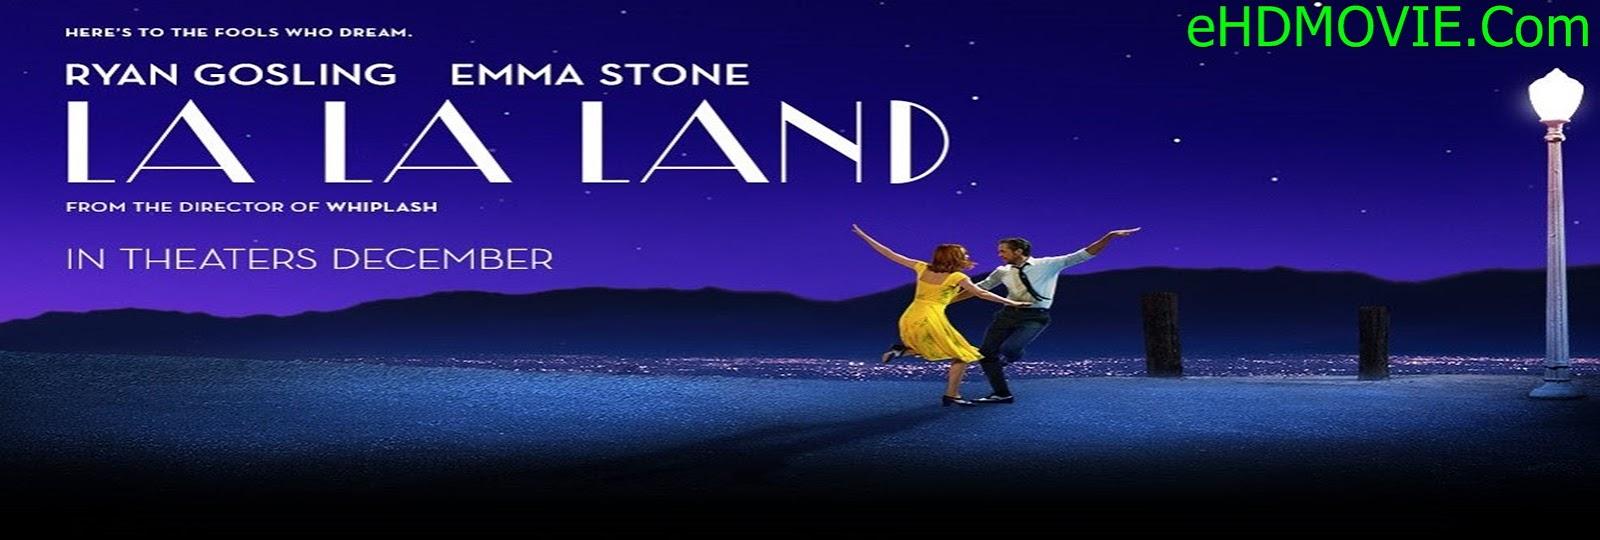 La La Land 2016 Full Movie English 1080p - 720p - HEVC - 480p ORG BRRip 400MB - 600MB - 900MB - 3.1GB ESubs Free Download